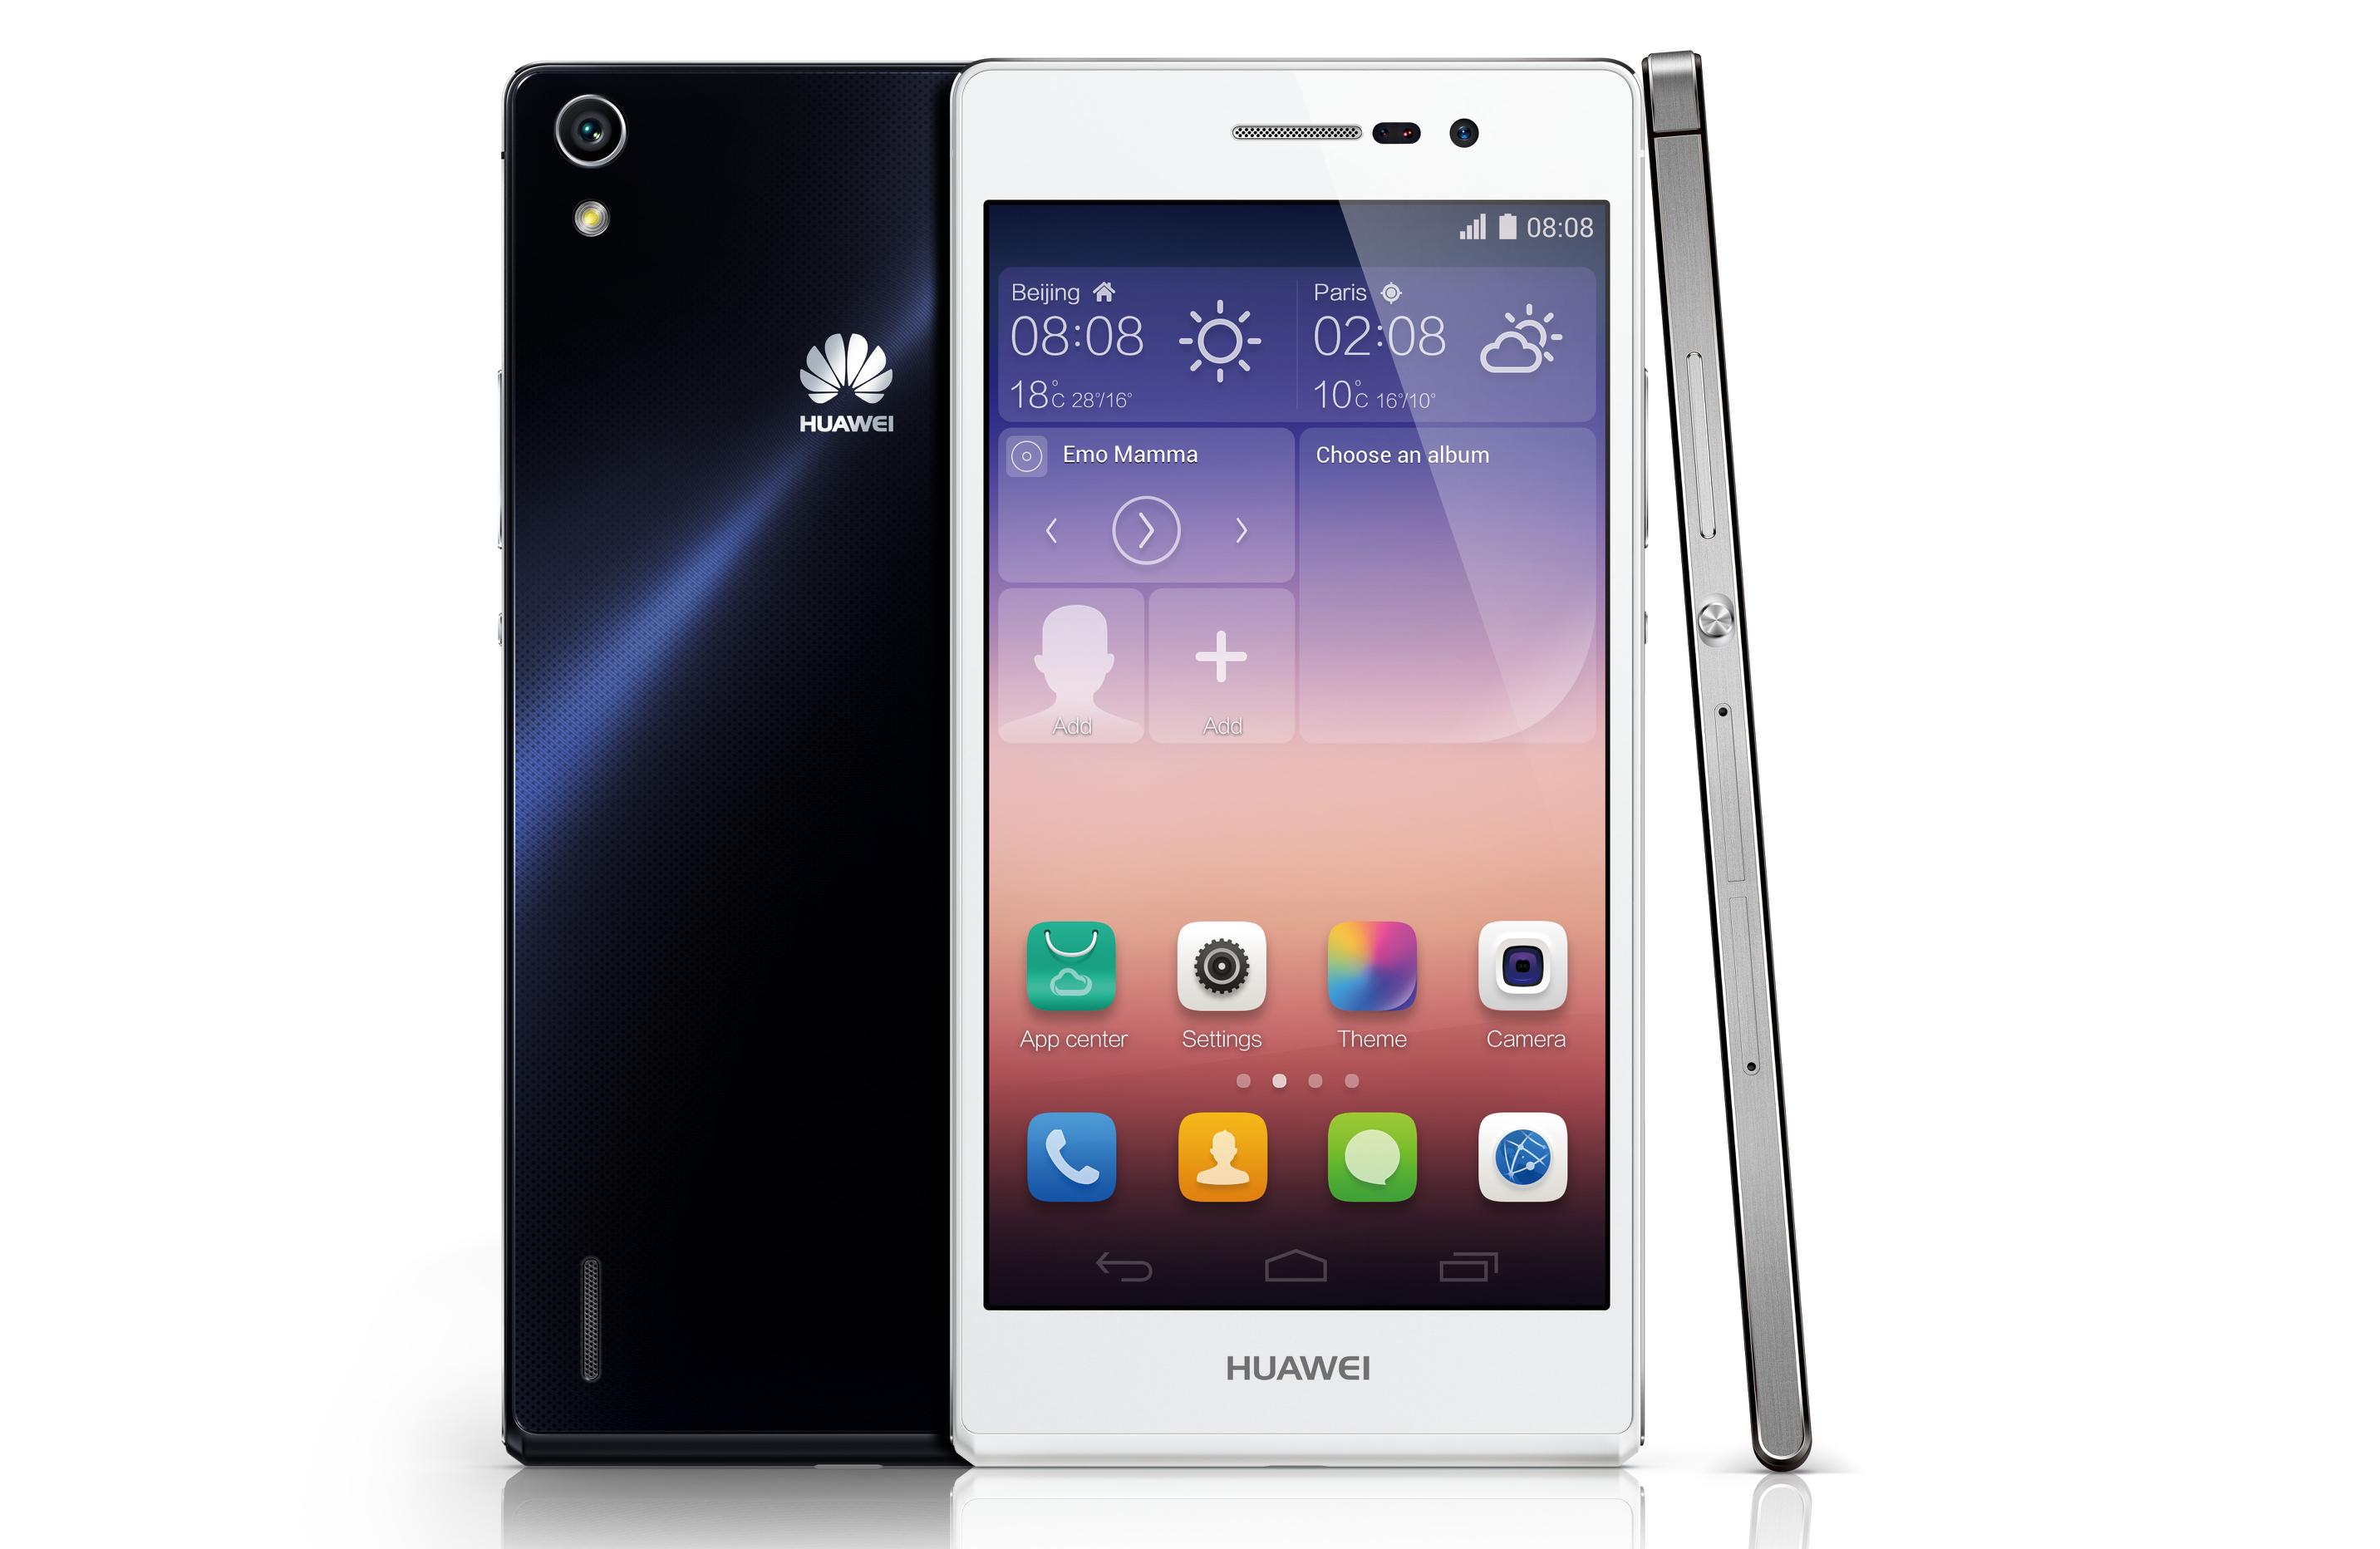 Huawei Ascend P7 va a ser actualizado a Android 5.1.1 Lollipop 1